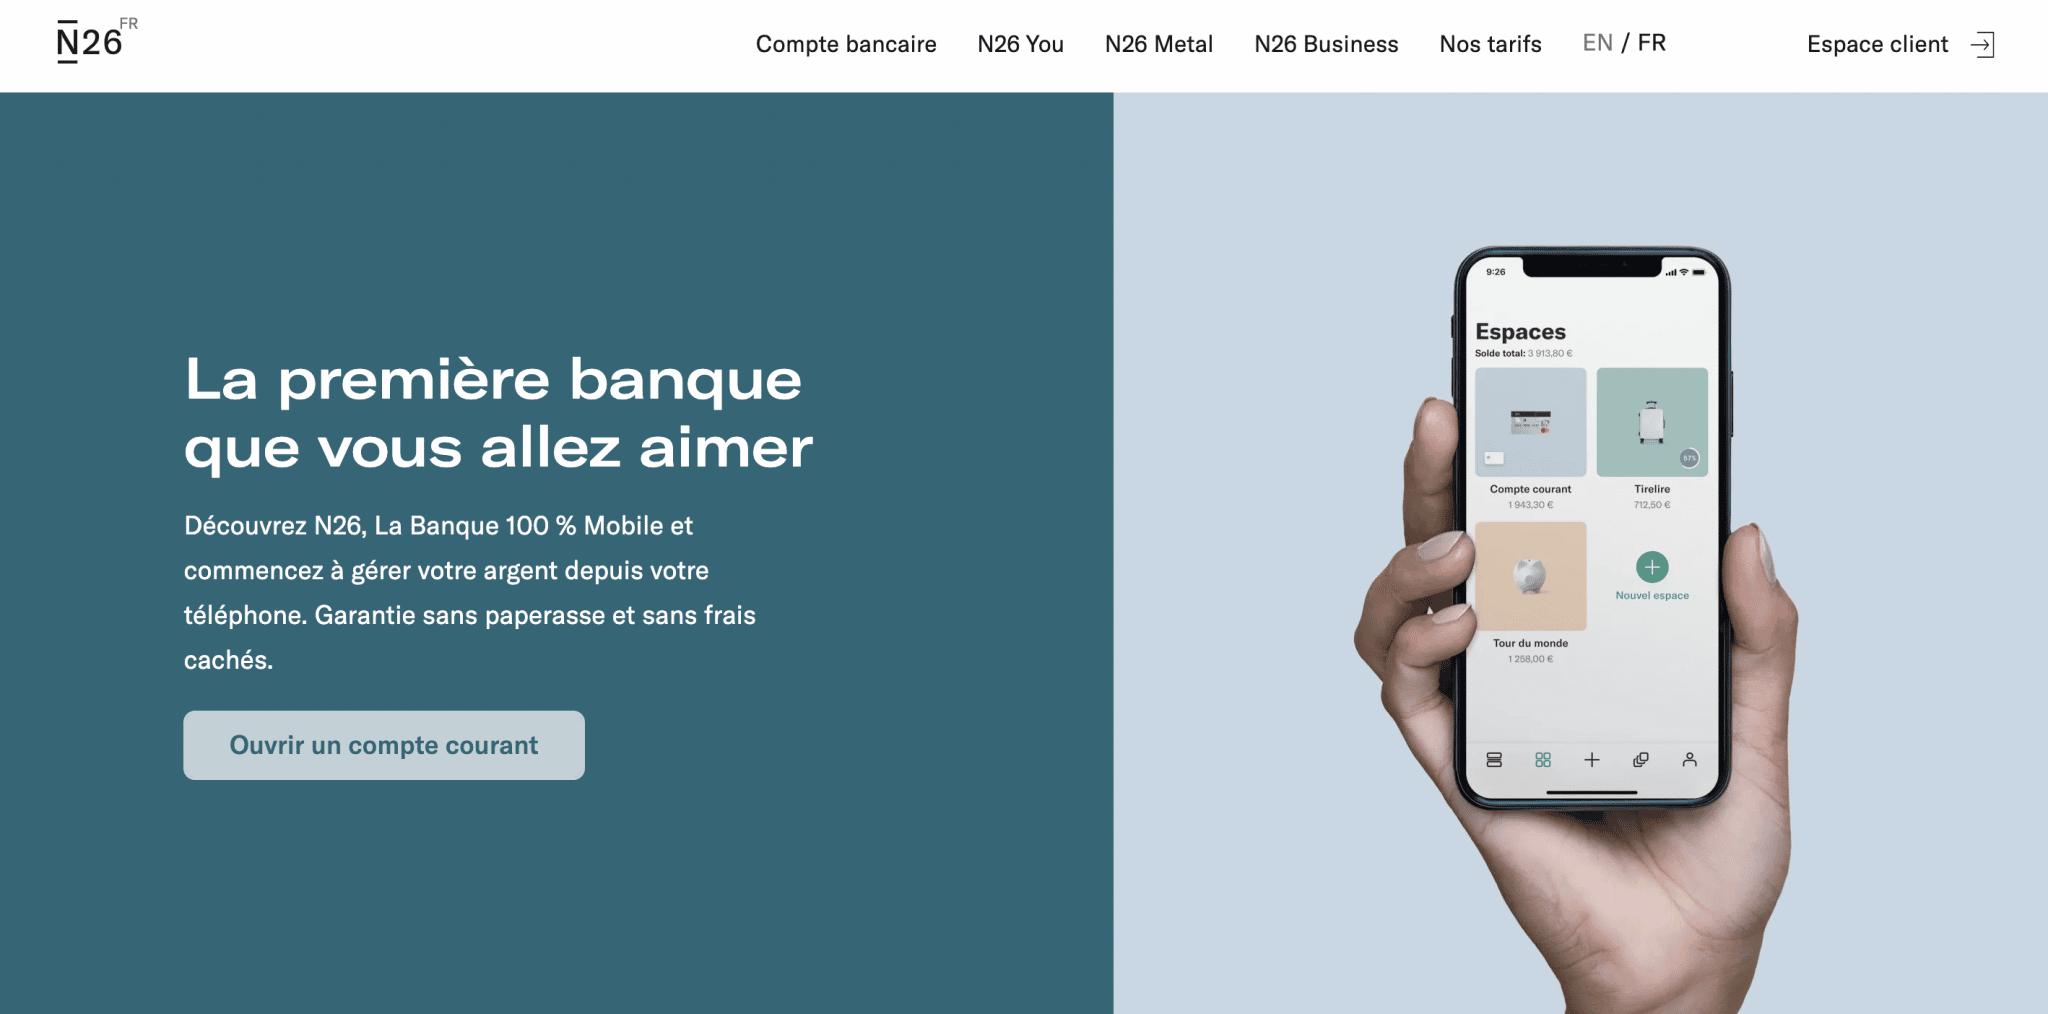 La banque en ligne et mobile N26